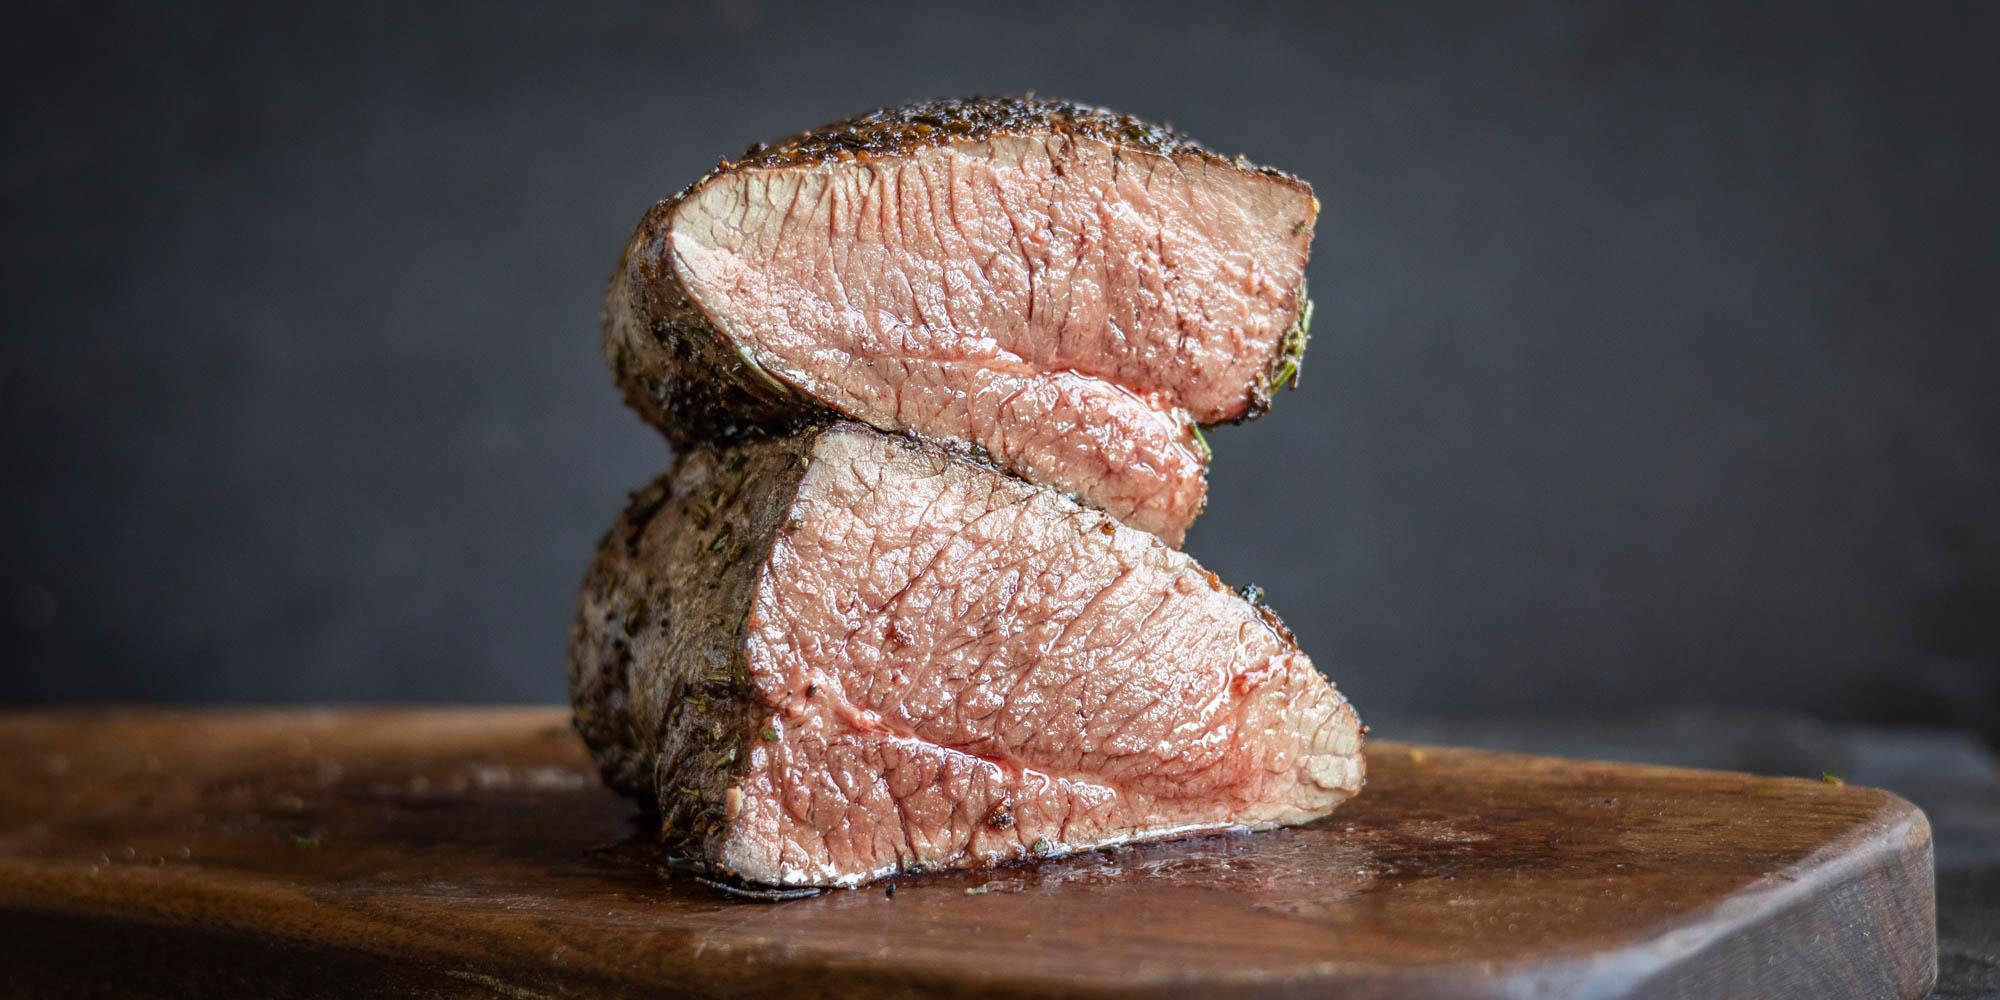 Perfect roast lamb or goat